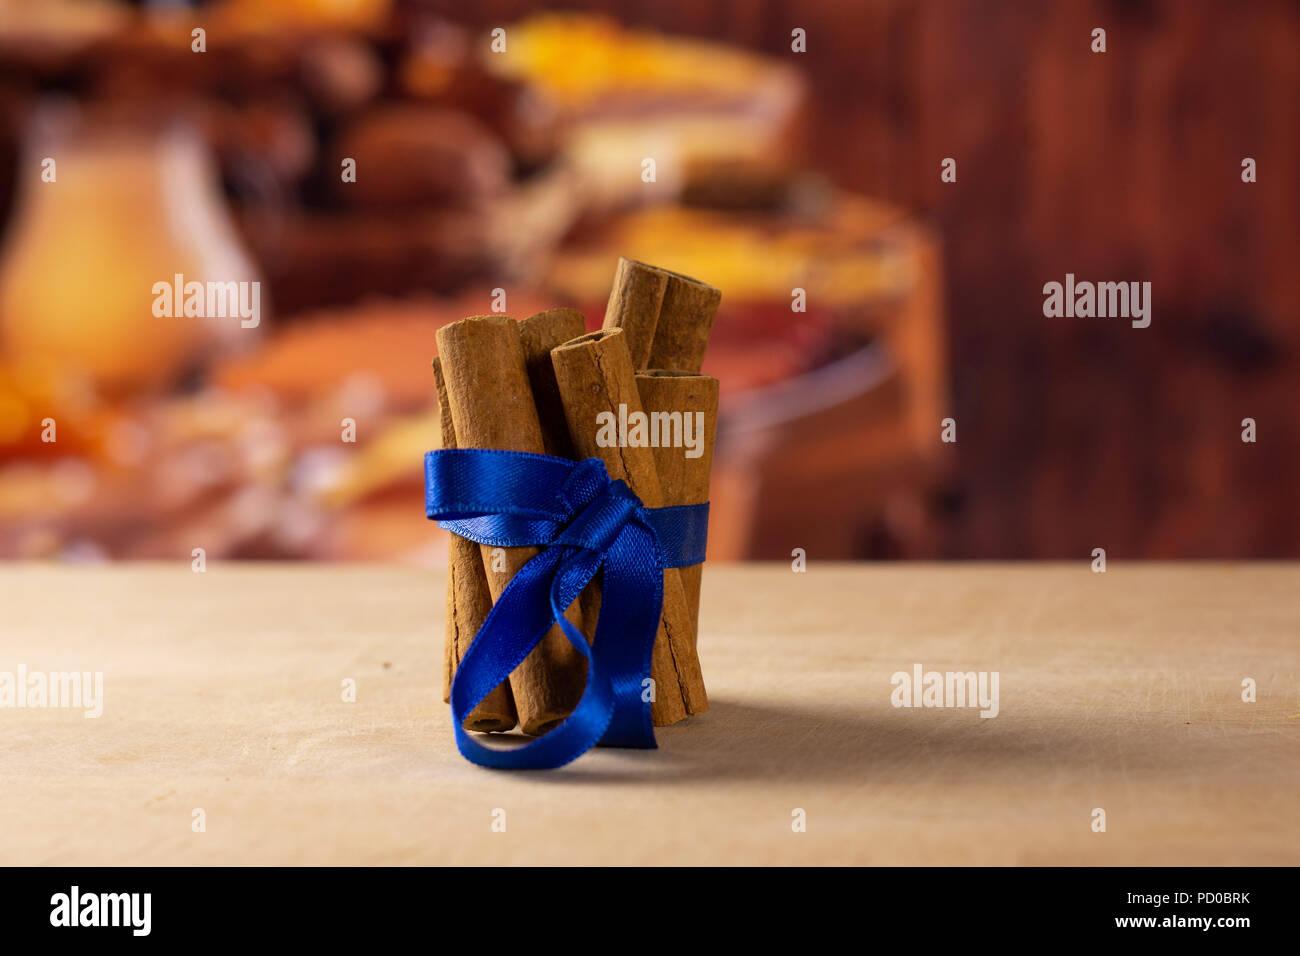 Qinamon Stock Photos & Qinamon Stock Images - Alamy